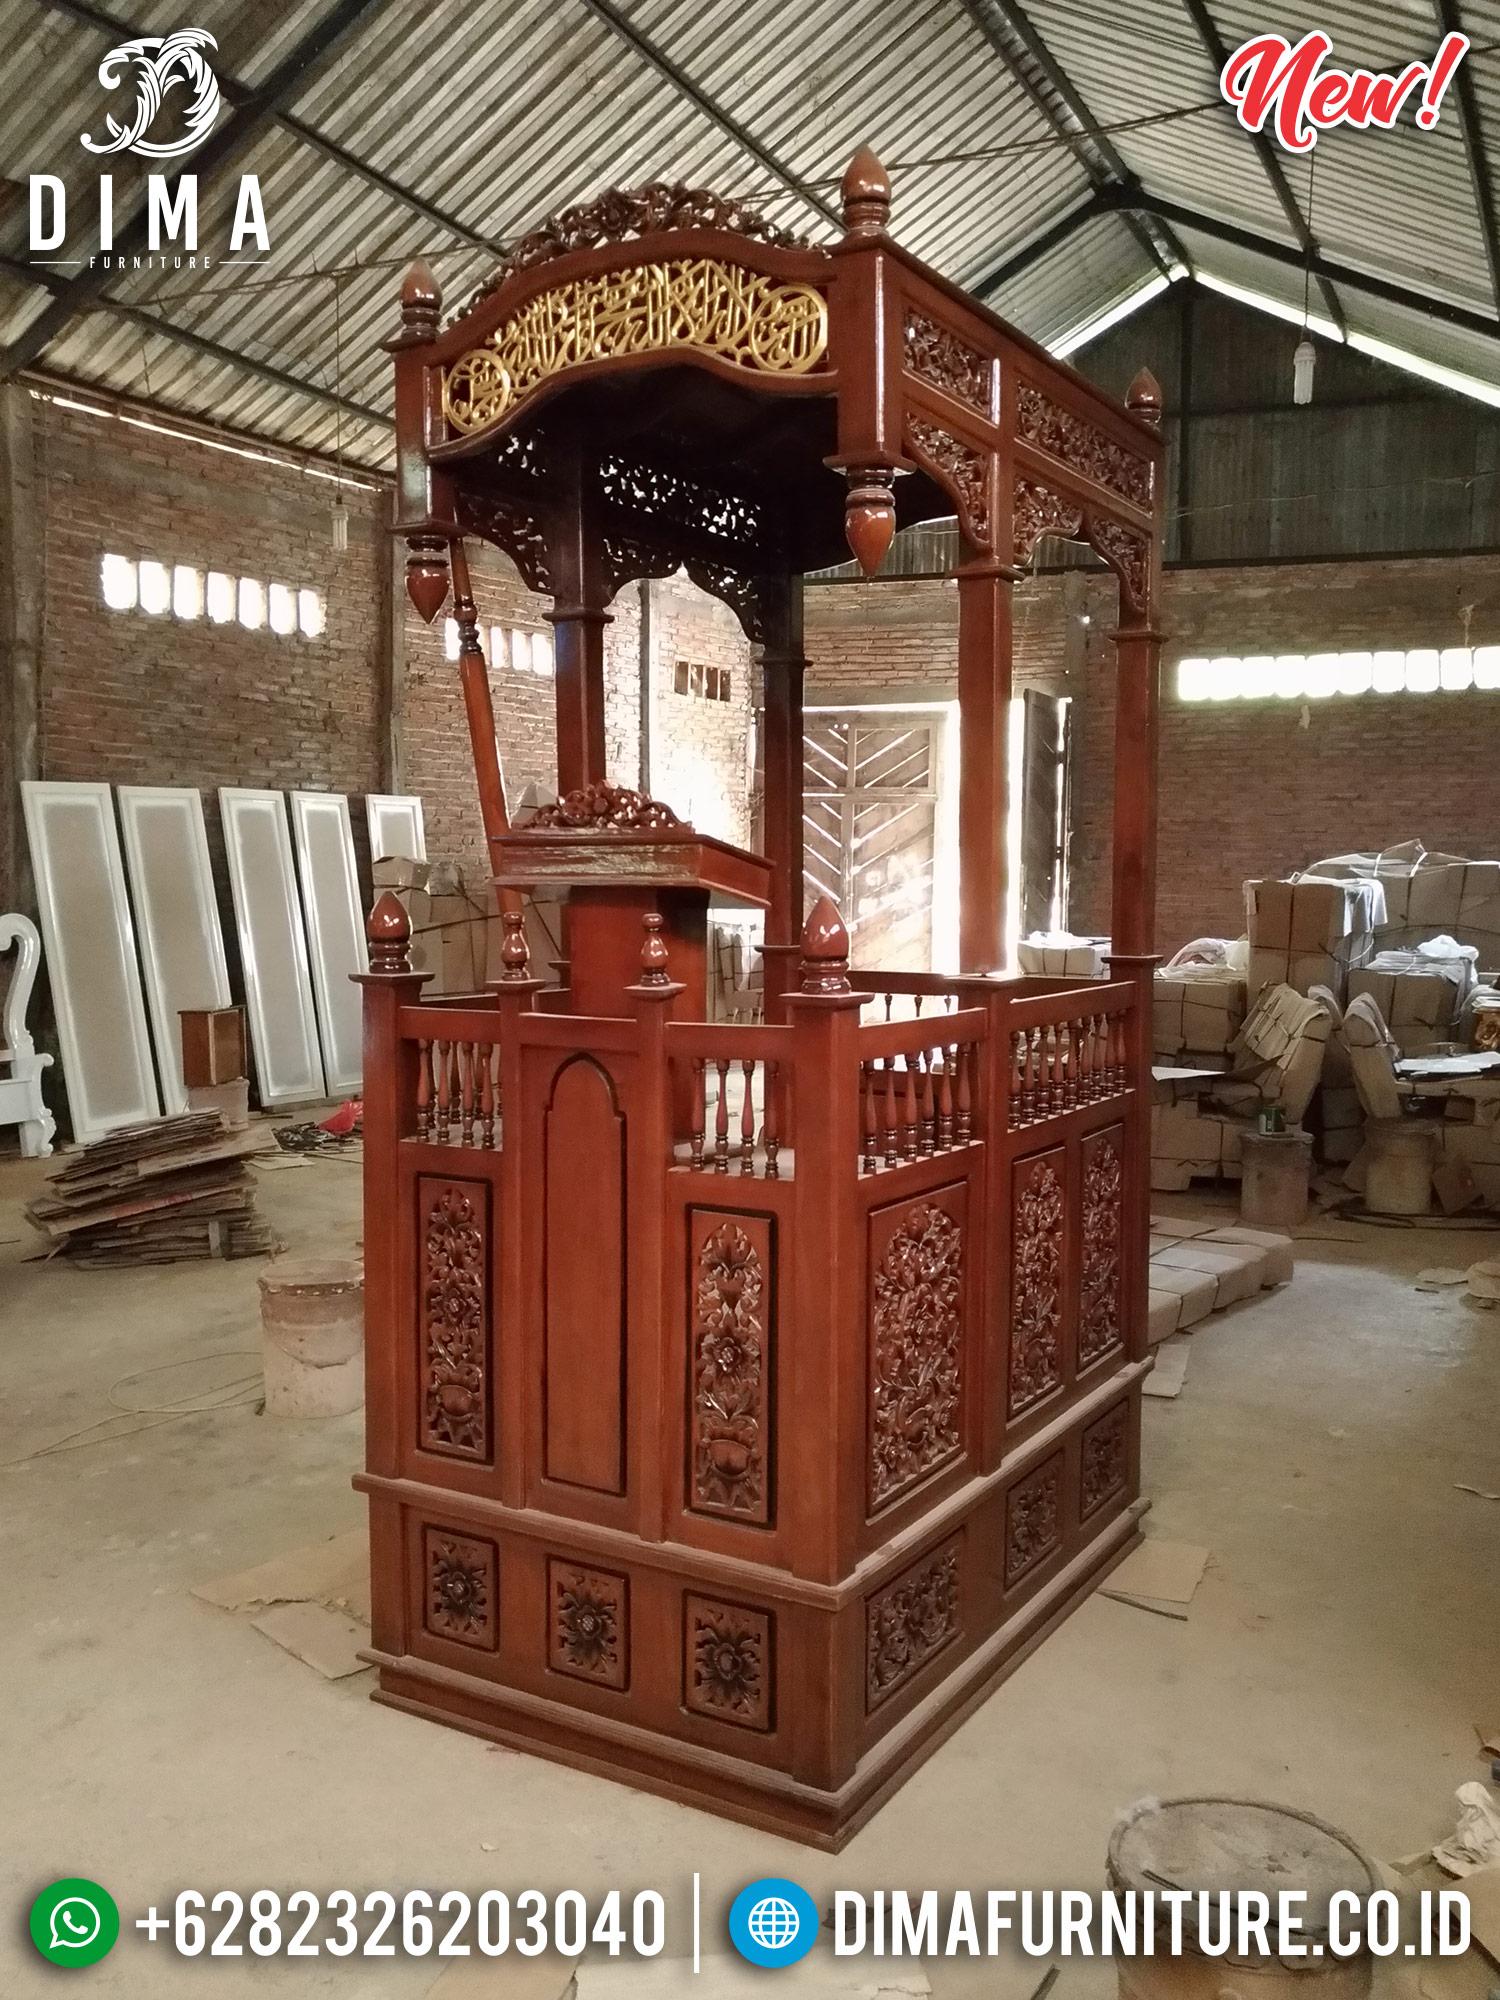 Mimbar Masjid Jati Jepara Ukiran Kaligrafi Gold DF-0995 Gambar 1